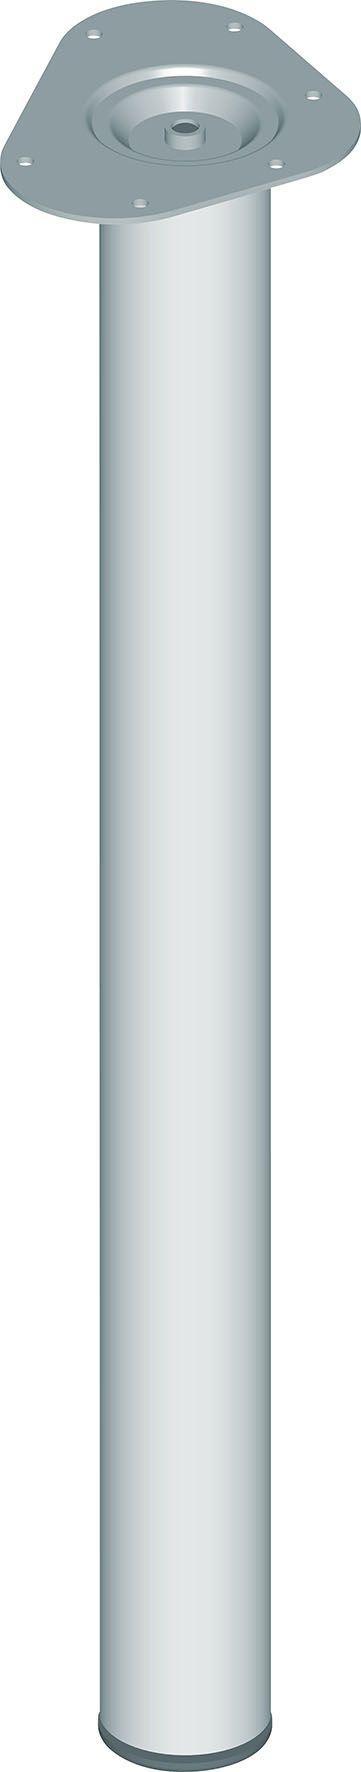 Mööblijalg Element System 700 mm